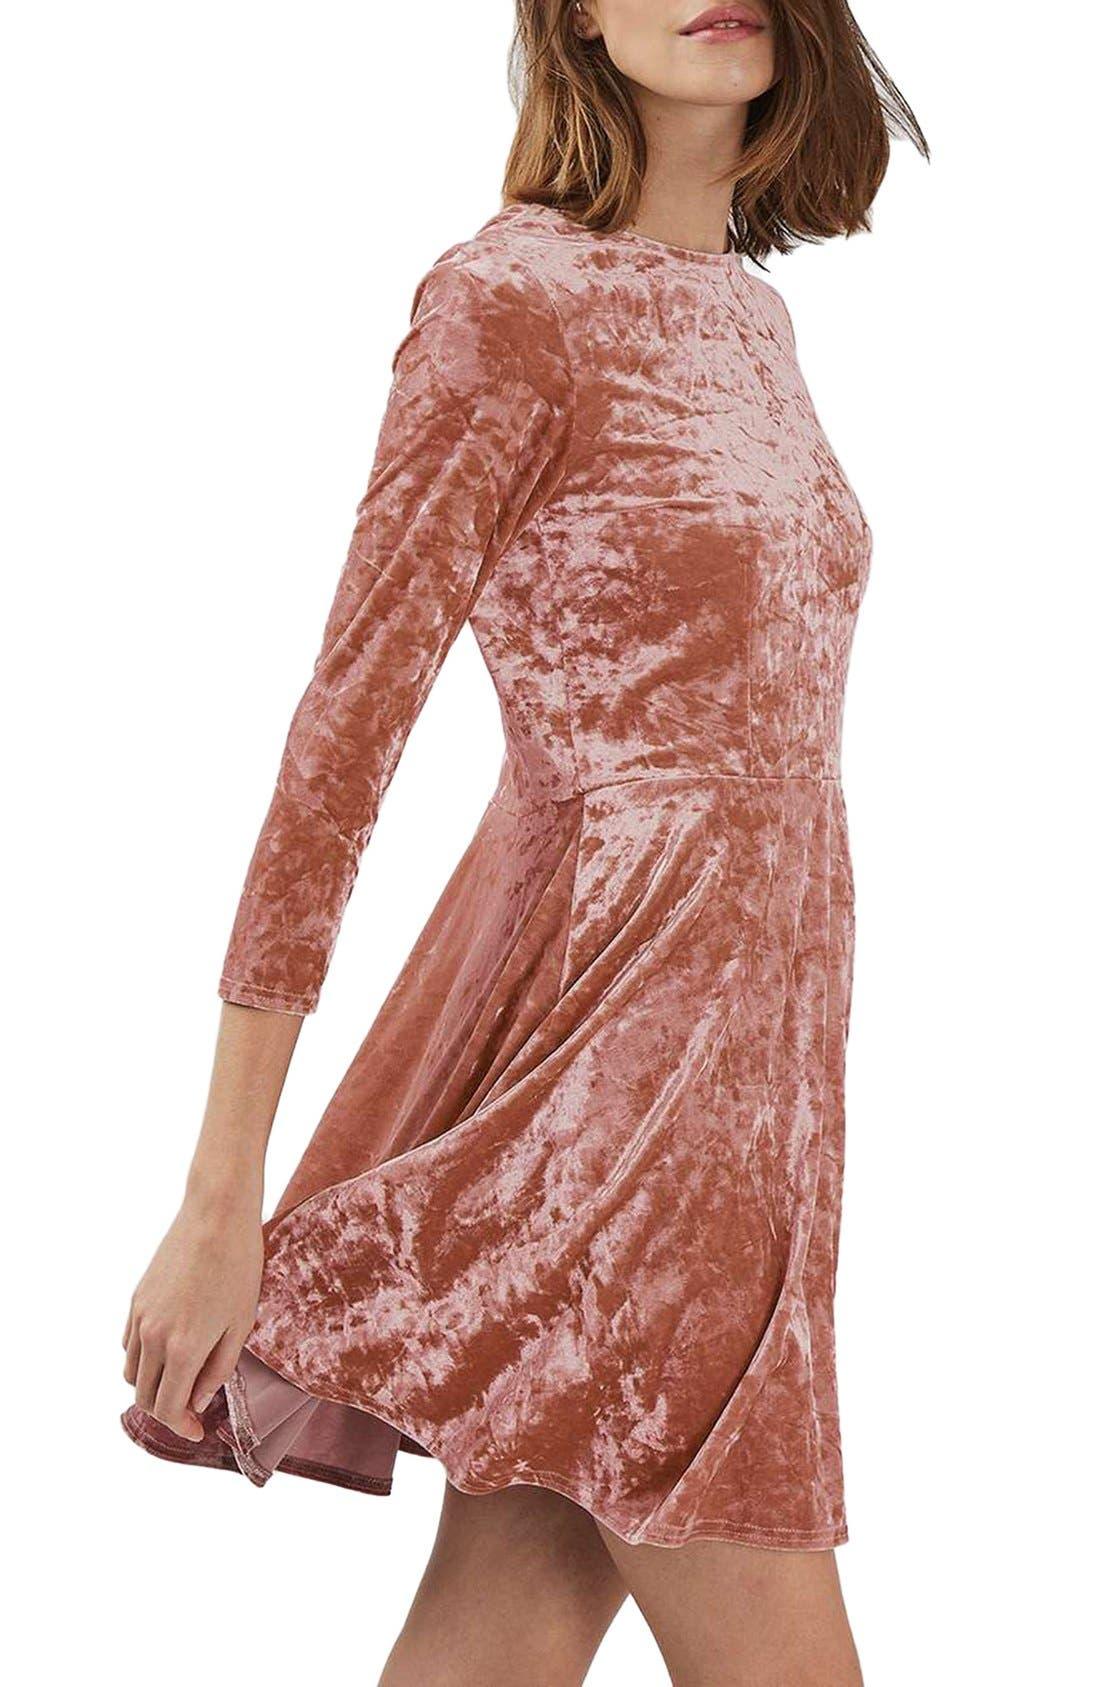 Crushed Velvet Dress,                             Main thumbnail 1, color,                             Pink